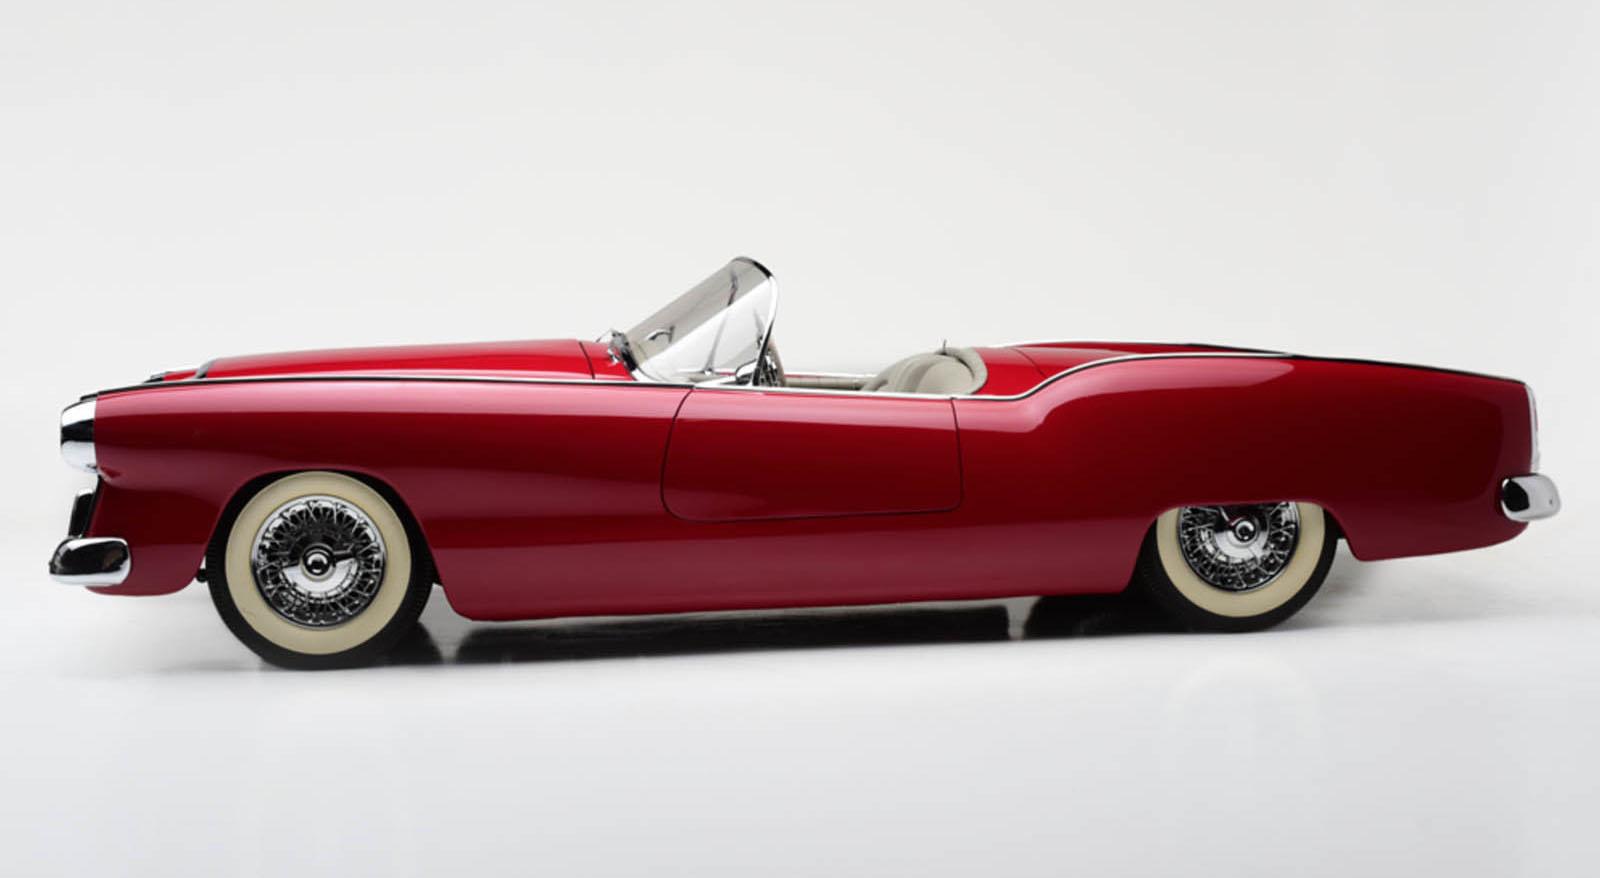 Plymouth Belmont concept 1954, Barret-Jackson 2018, subasta Barret-Jackson